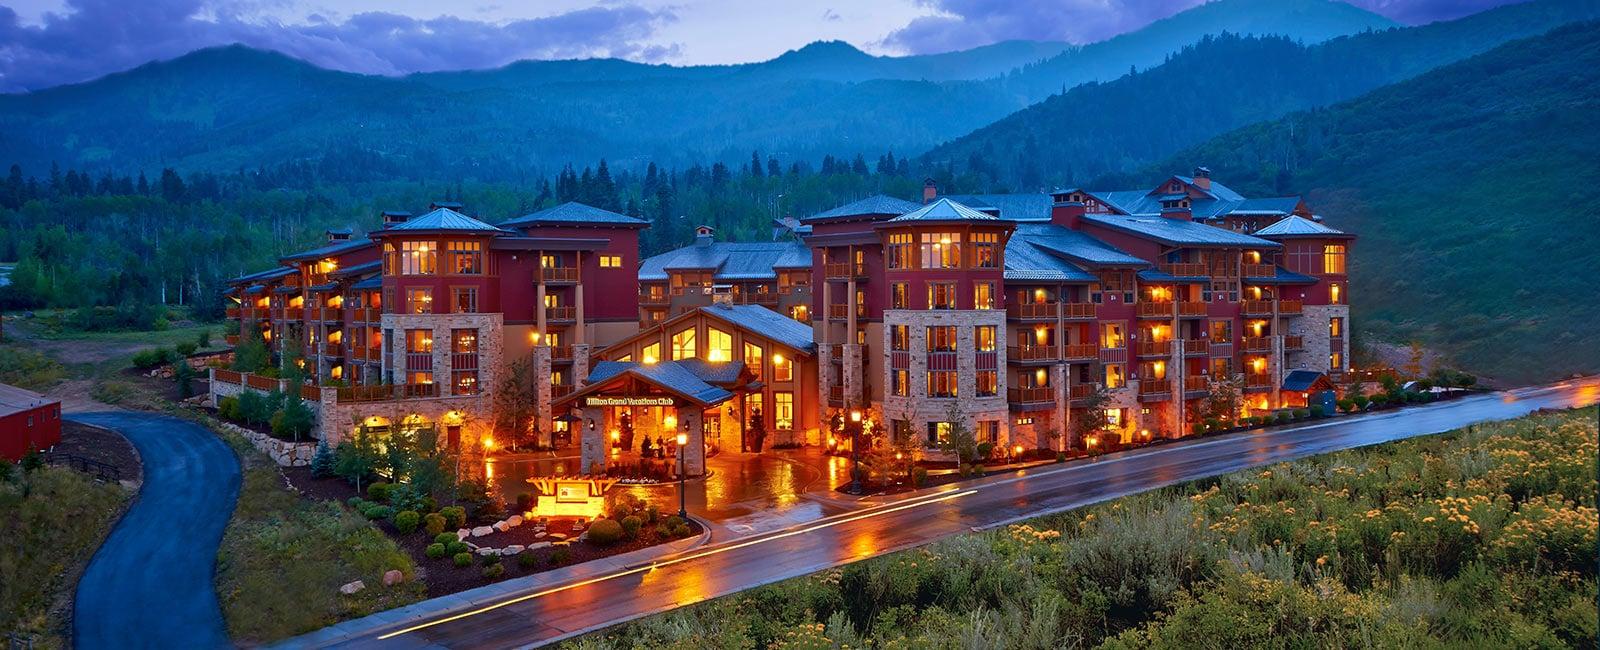 Hilton Grand Vacations club at Sunrise Lodge image